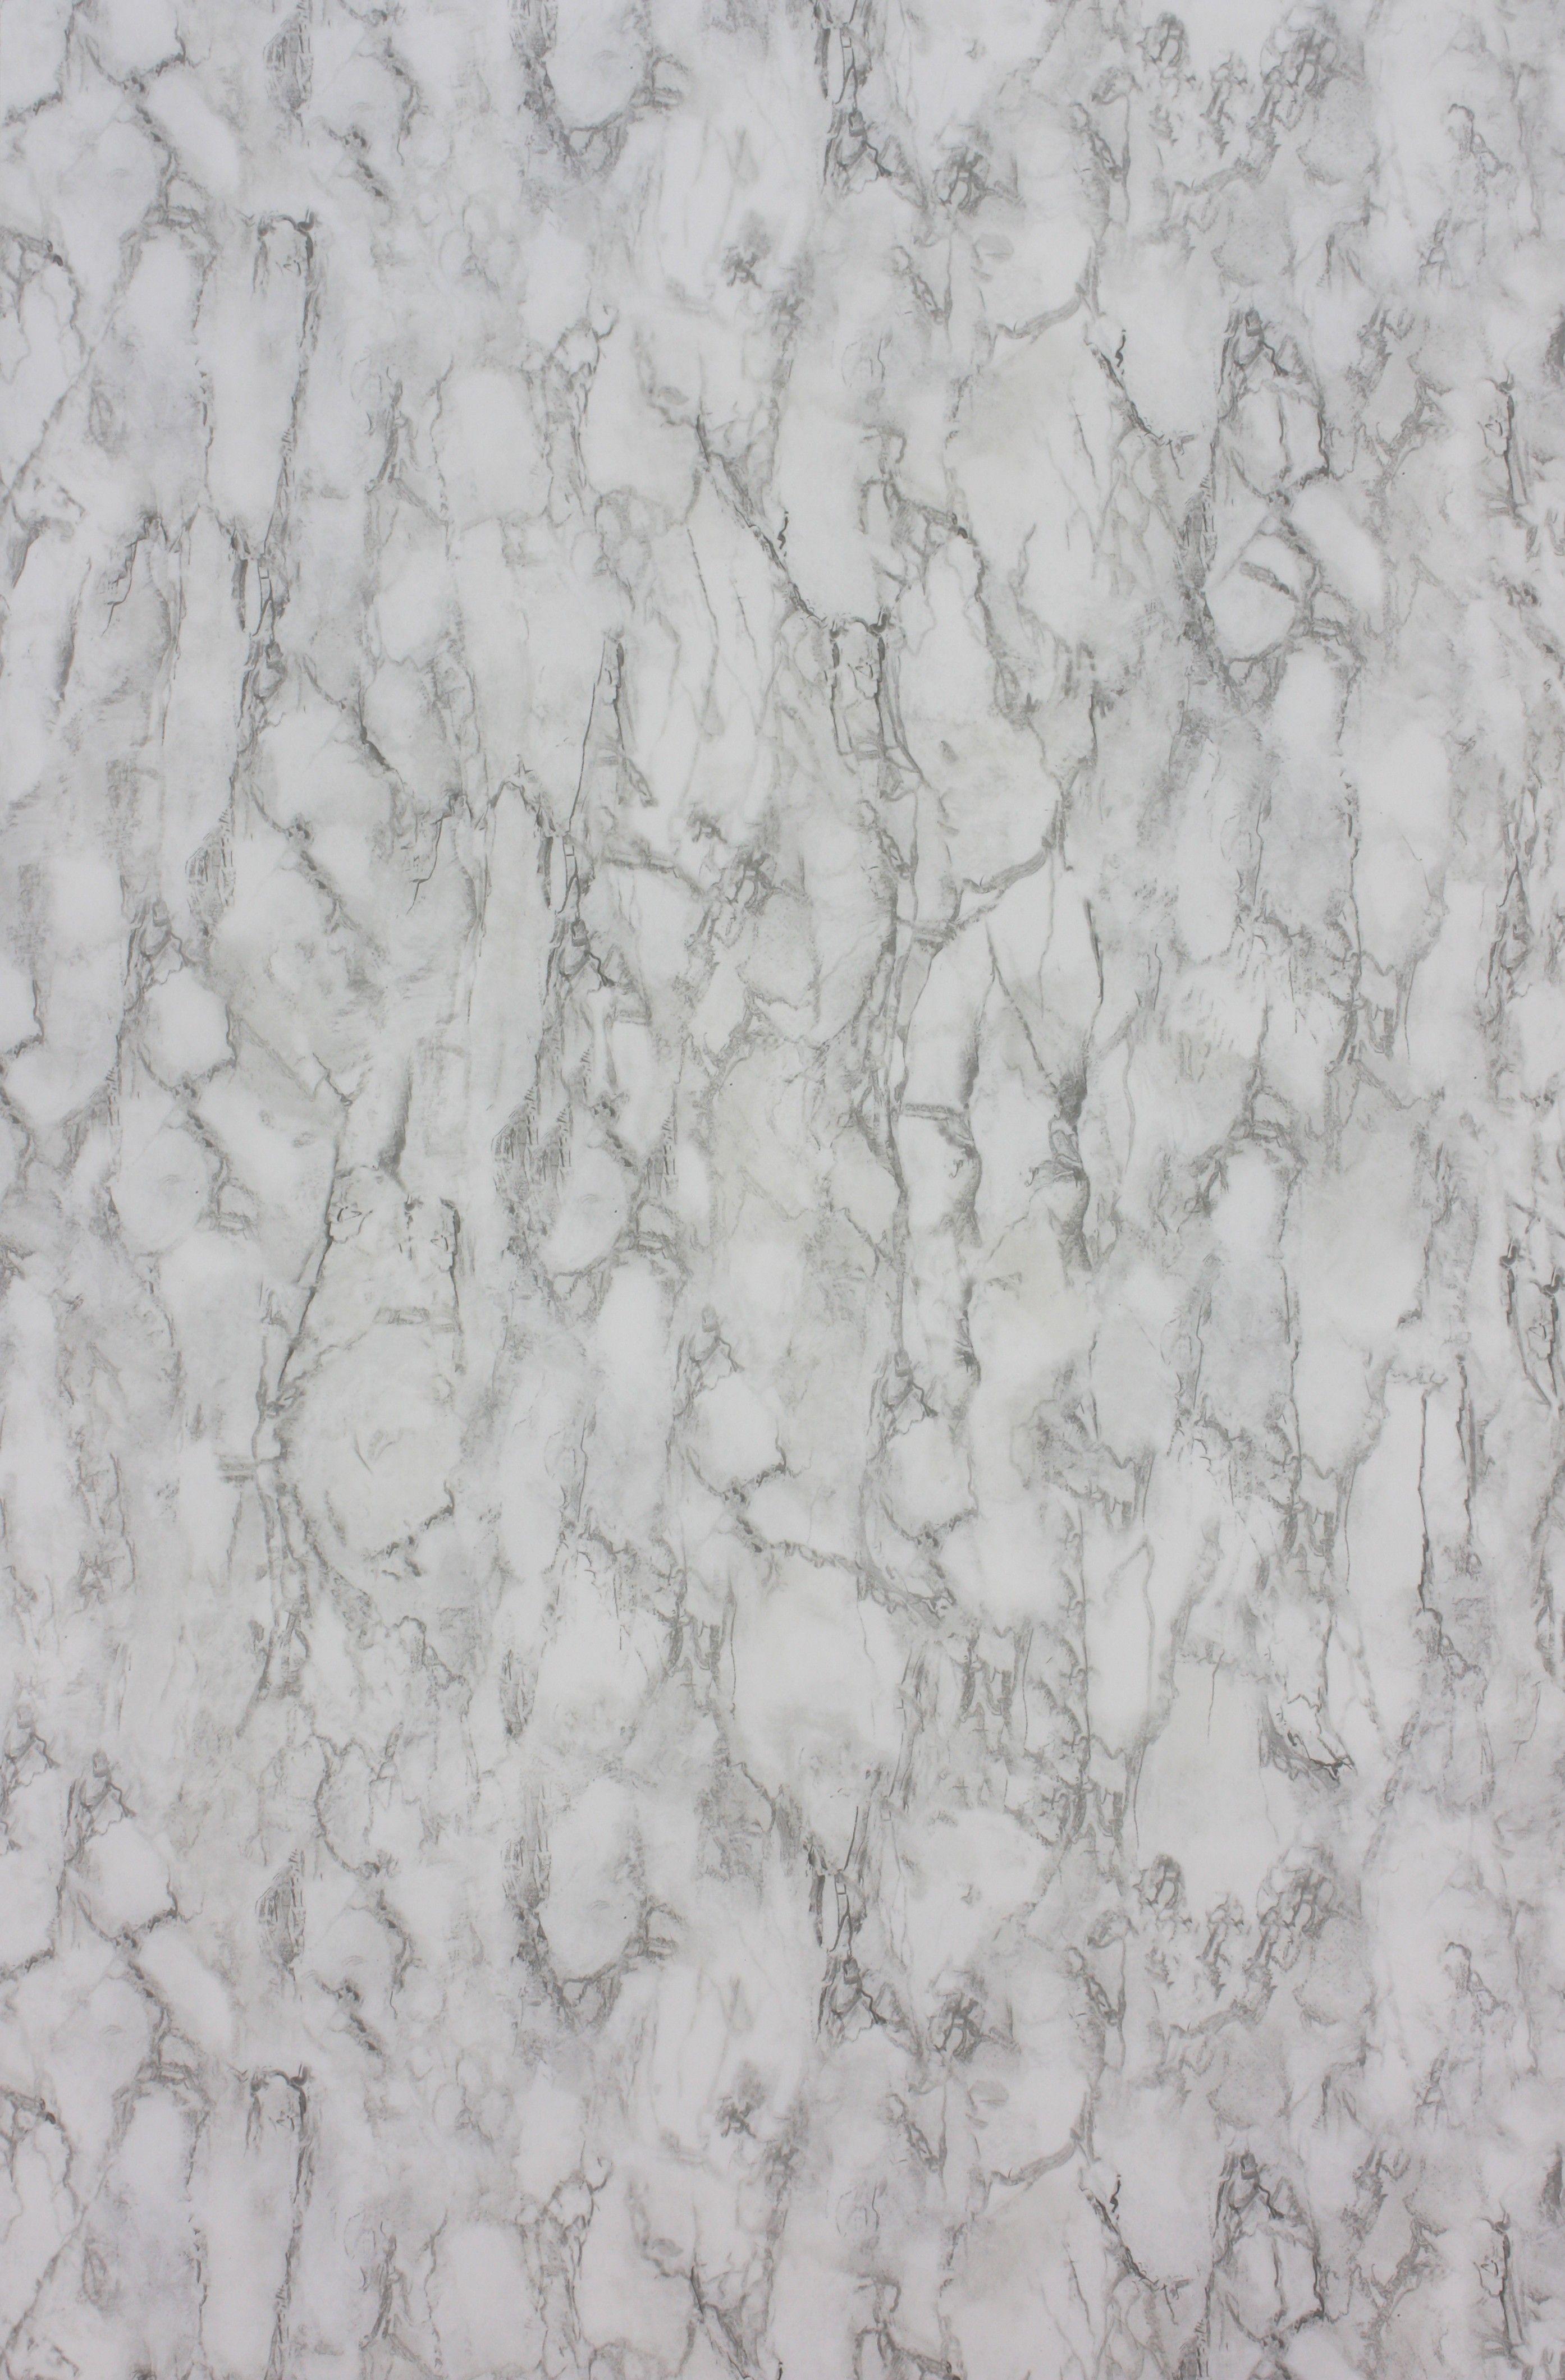 Fantastic Wallpaper Marble Plain - 1aae5d2834b084ab52eb04e477cbb330  Pictures_904716.jpg